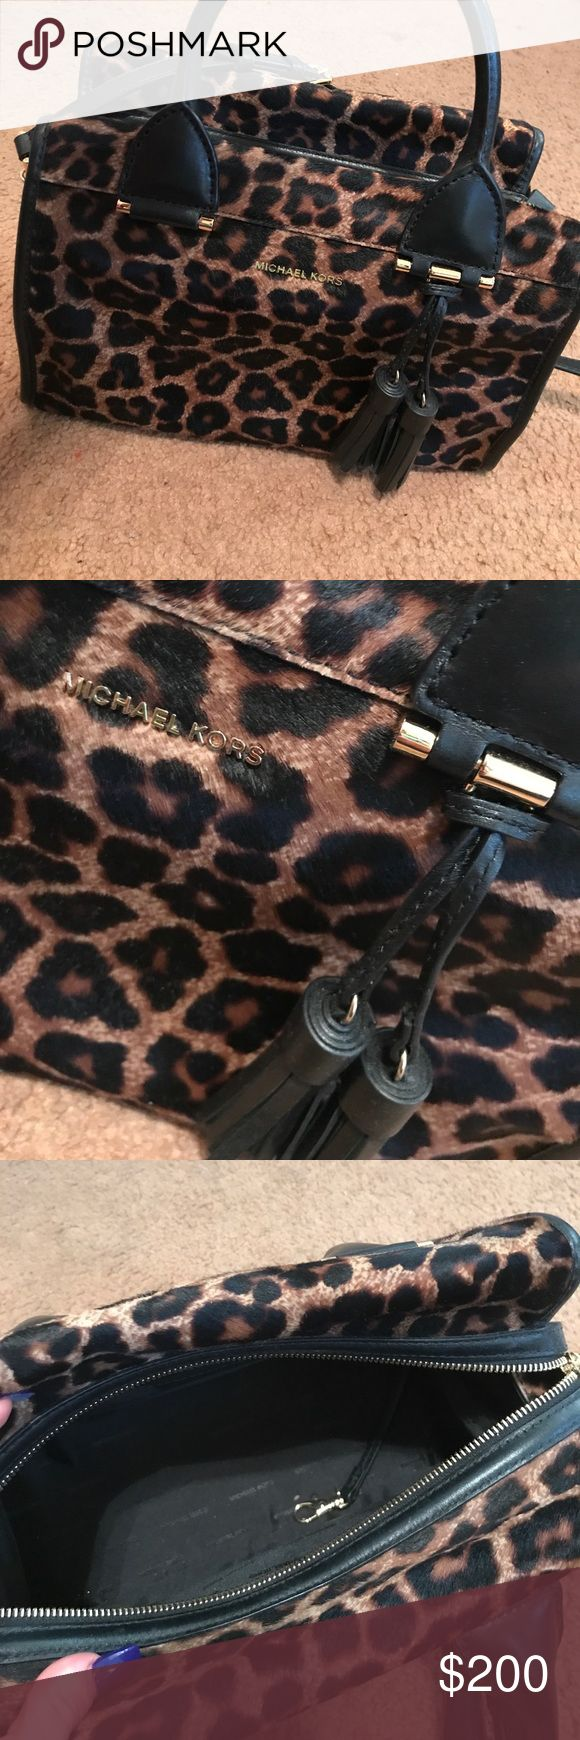 Michael Kors Cross body / handbag Never been used Micheal Kors handbag!! Easily detachable cross body strap. Perfect for the fall. Michael Kors Bags Crossbody Bags